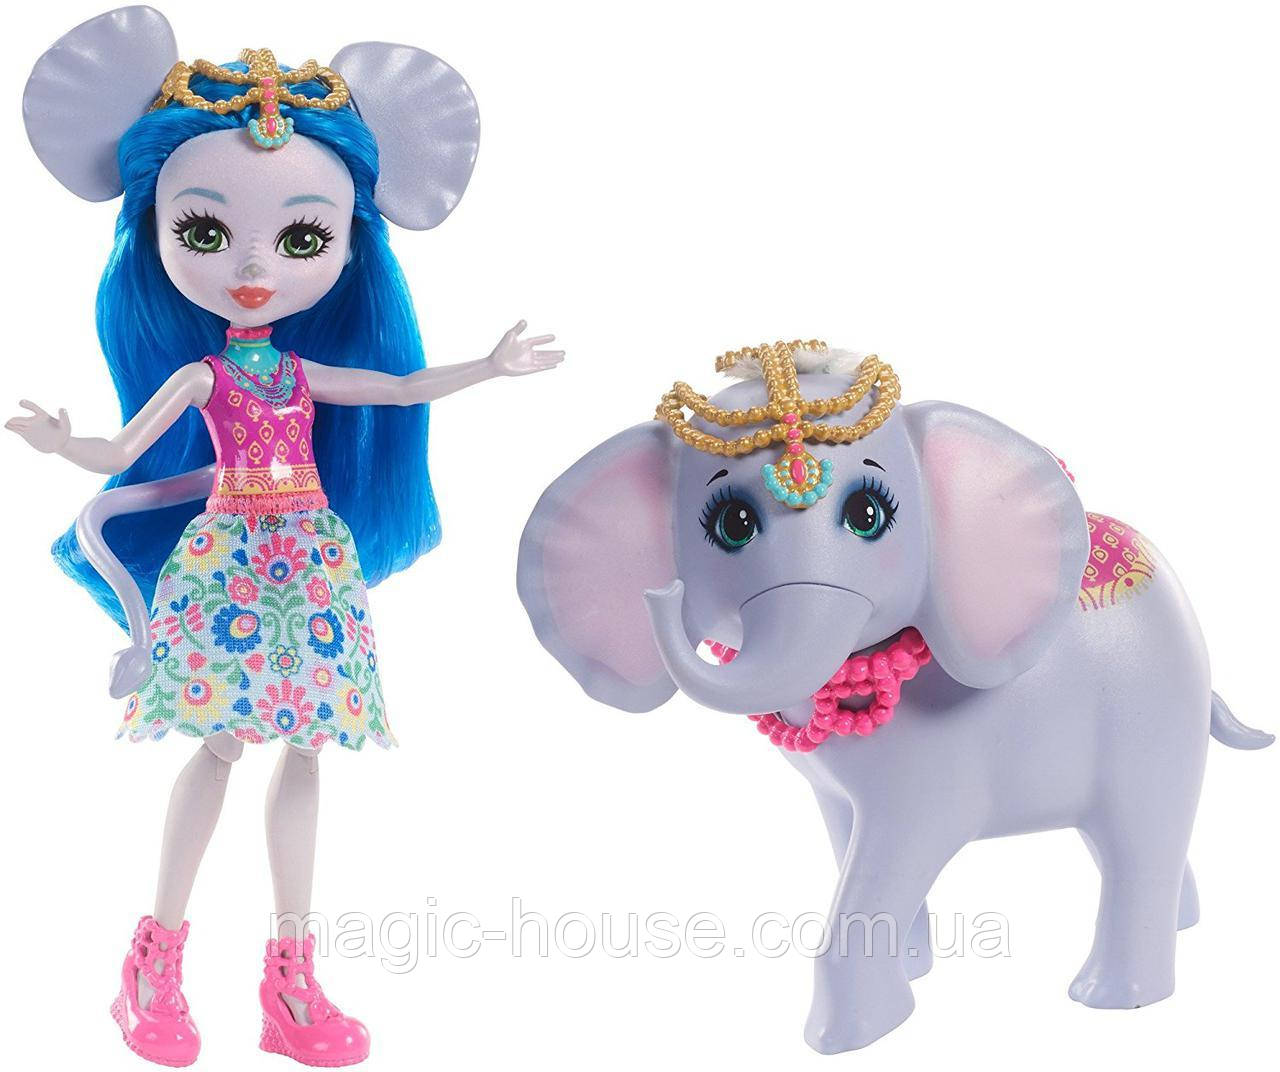 Лялька Энчантималс Слоник Катерина і один Антик Enchantimals Ekaterina Elephant Dolls with Antic